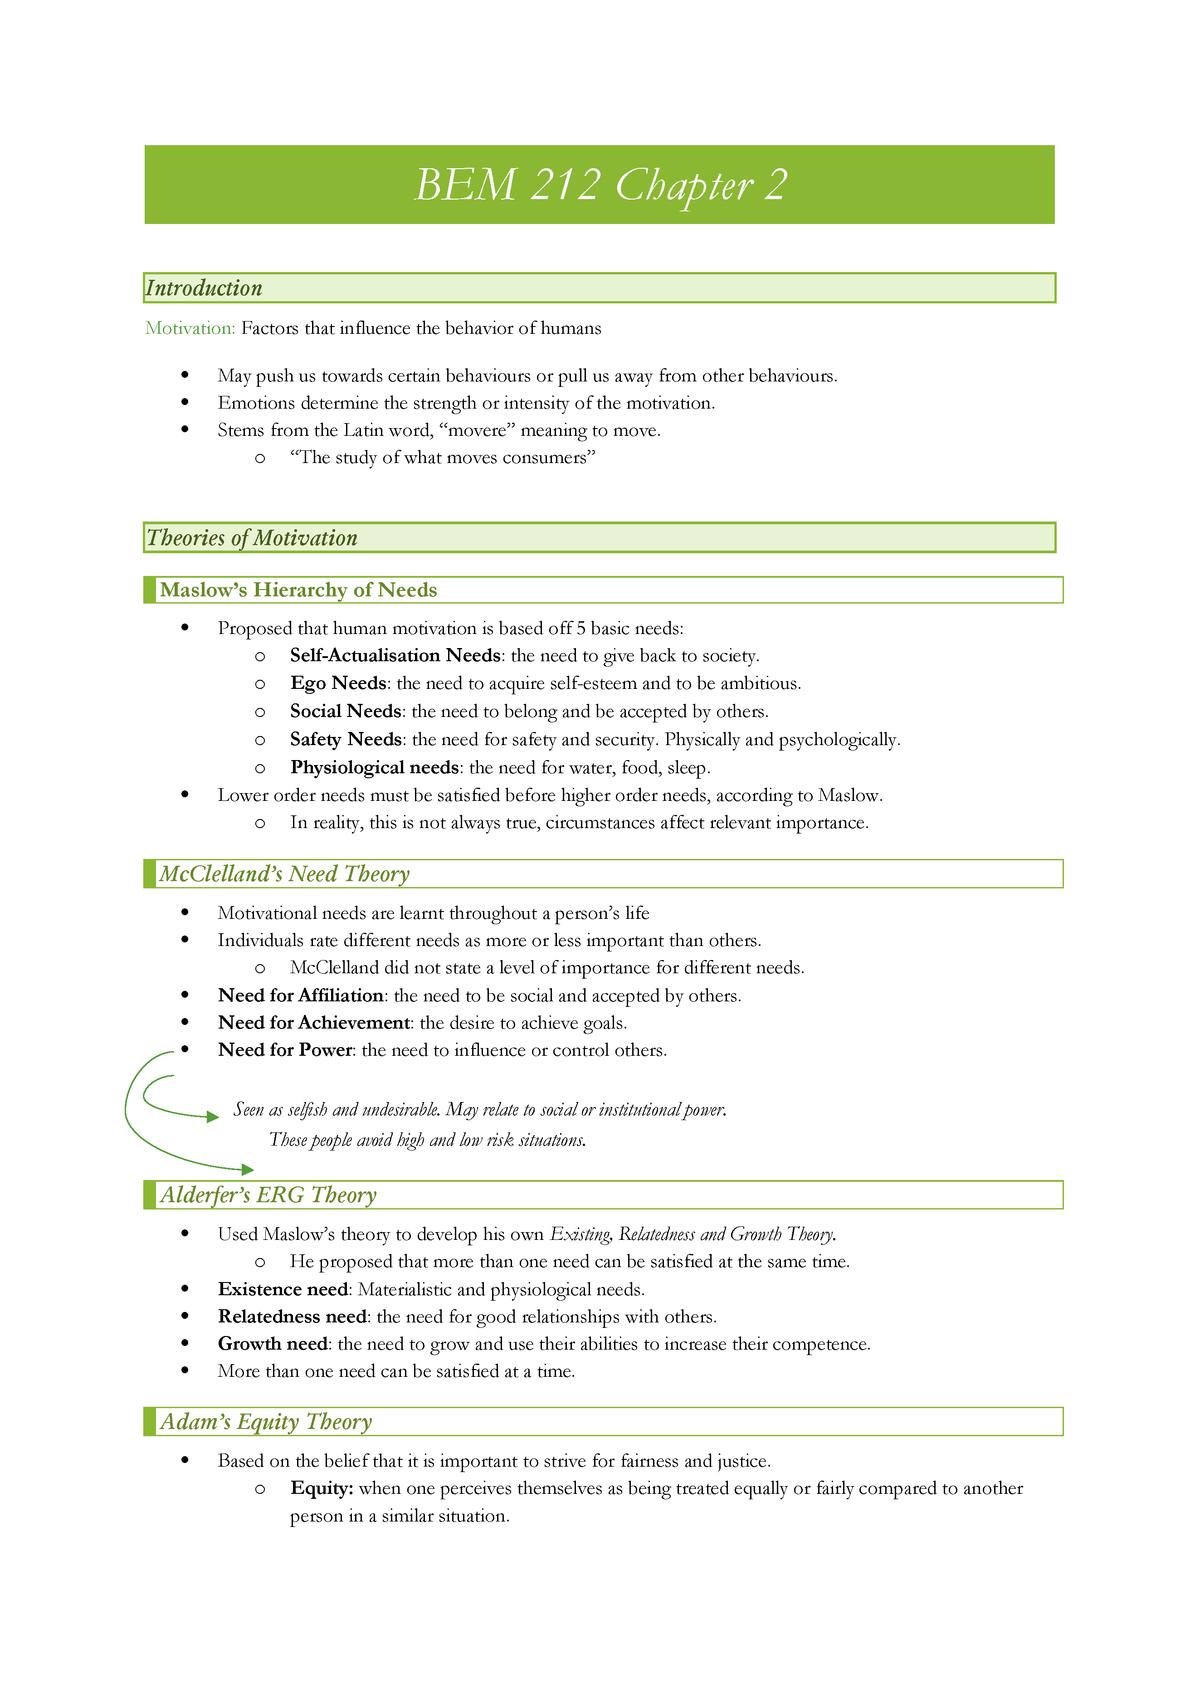 BEM 212 Chapter 2 - Summary Consumer Behaviour - BEM 212